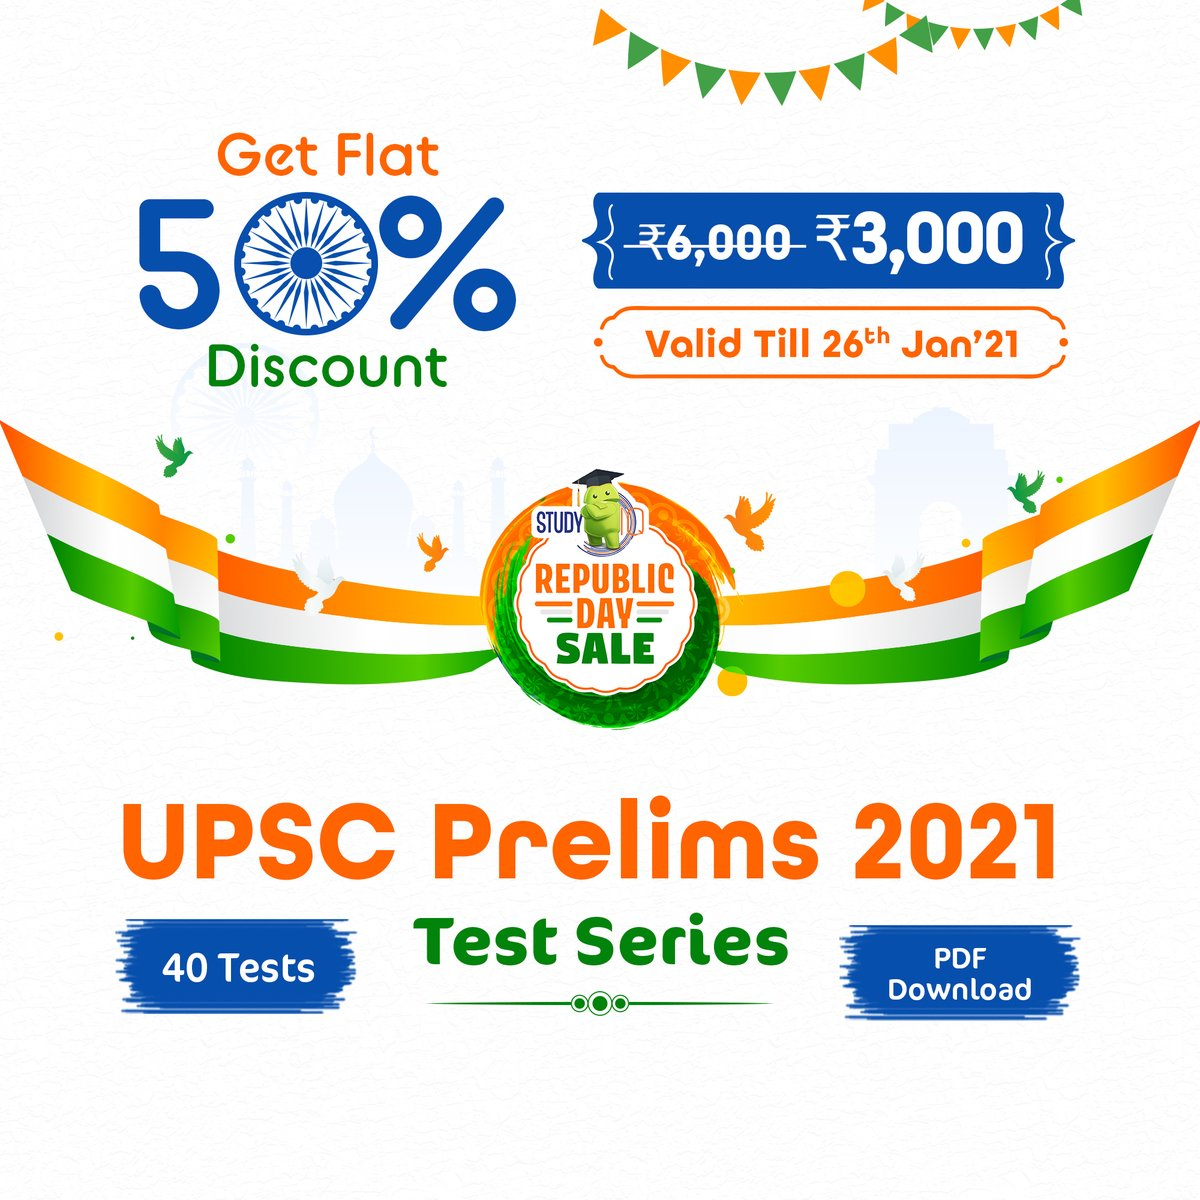 #RepublicDaySale! #UPSC Prelims test series covering basic level #NCERT tests, application-based Sectional Tests, simulative mock tests.  It consists of 40 tests (8 NCERT, 16 Sectional, 9 Mock tests, 6 Revision tests, 1 Current Affairs test). Visit: